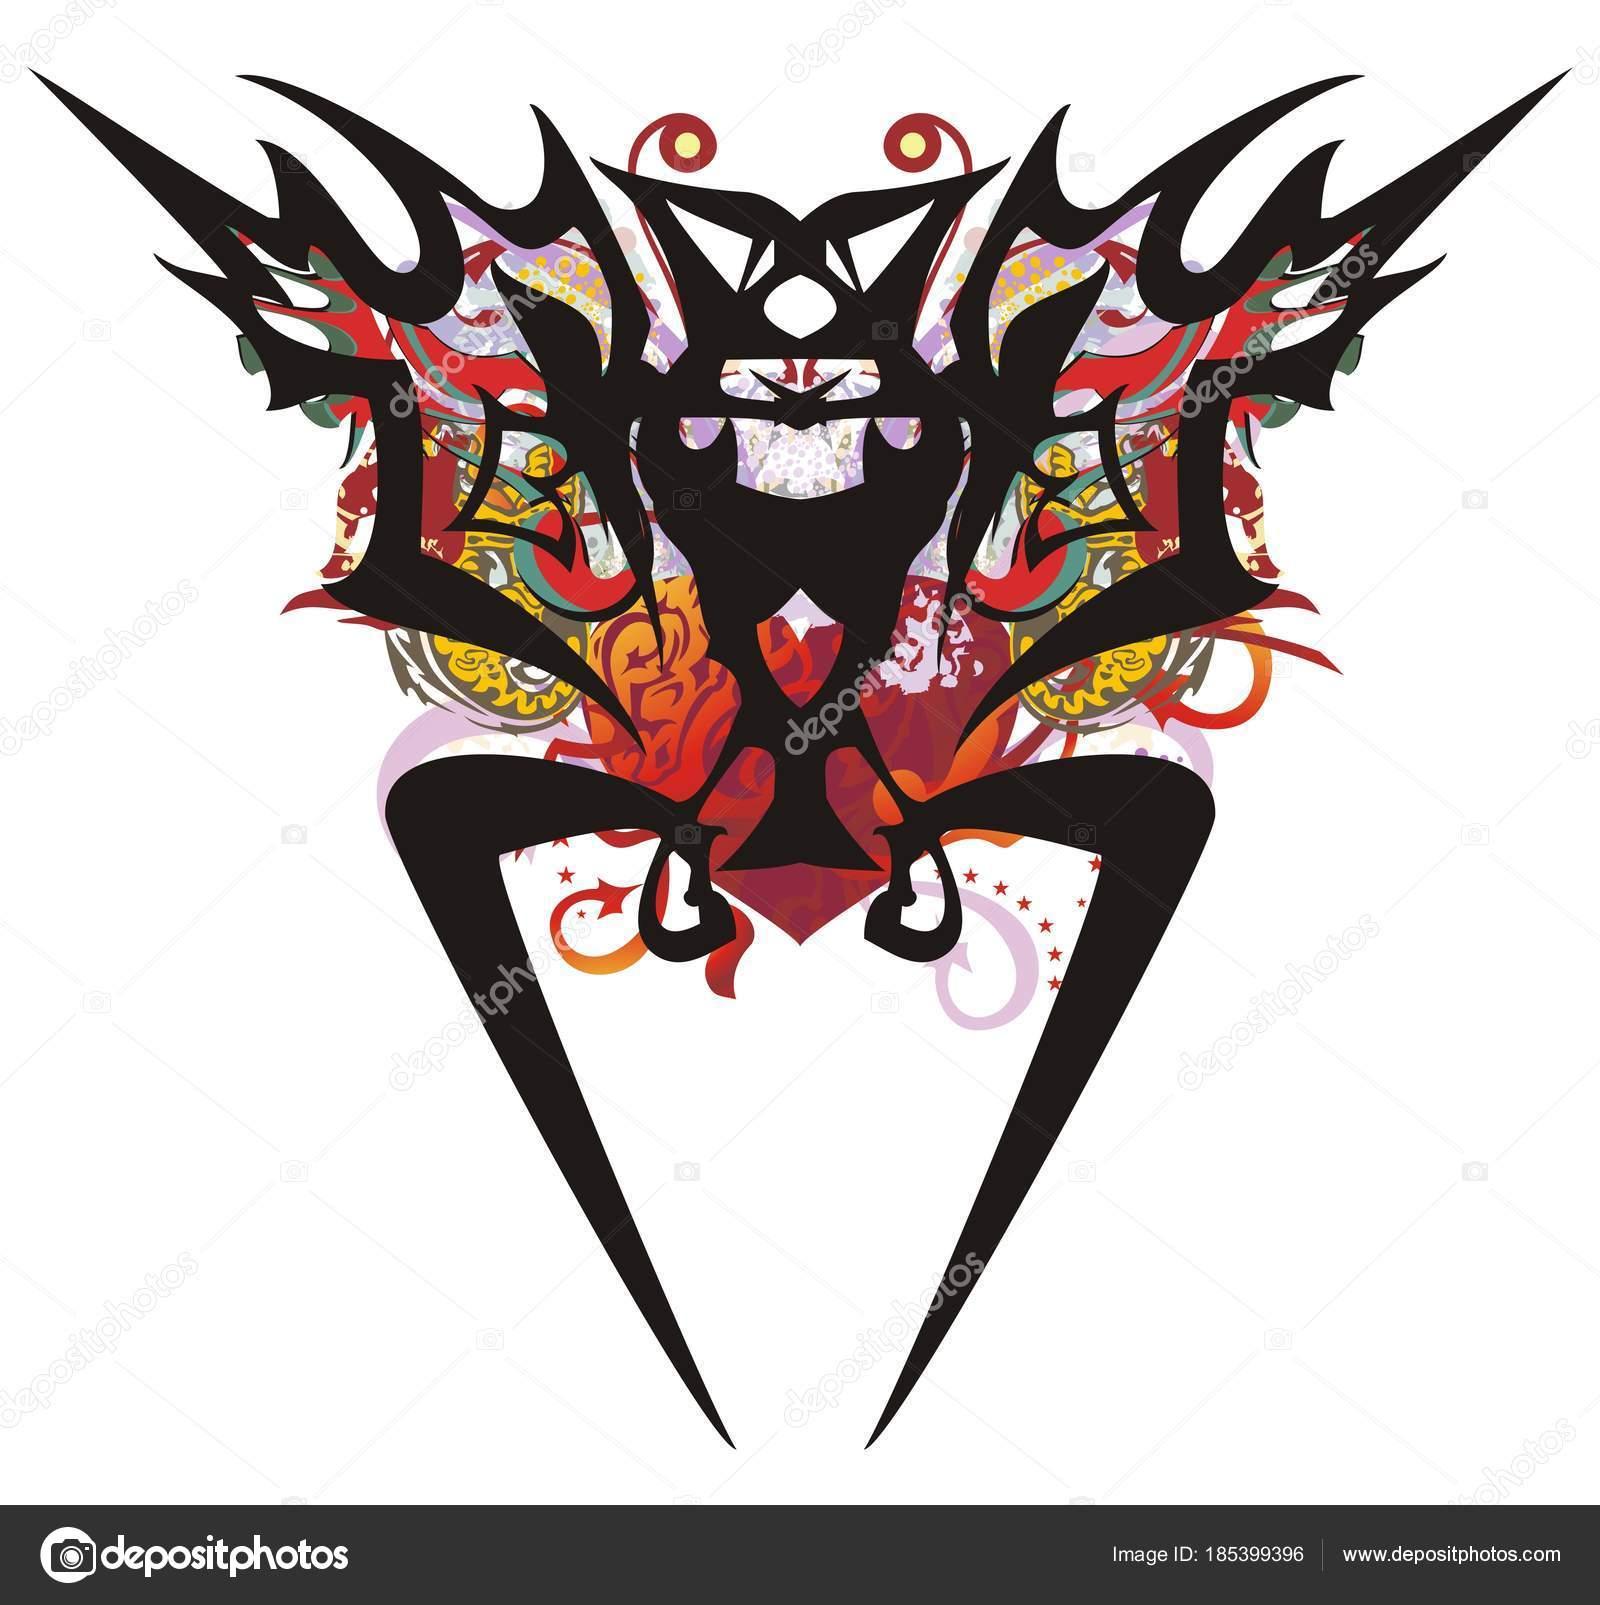 6332ef7fd Grunge Tribal Bat Symbol Red Heart Peaked Ethnic Bat Background — Stock  Vector